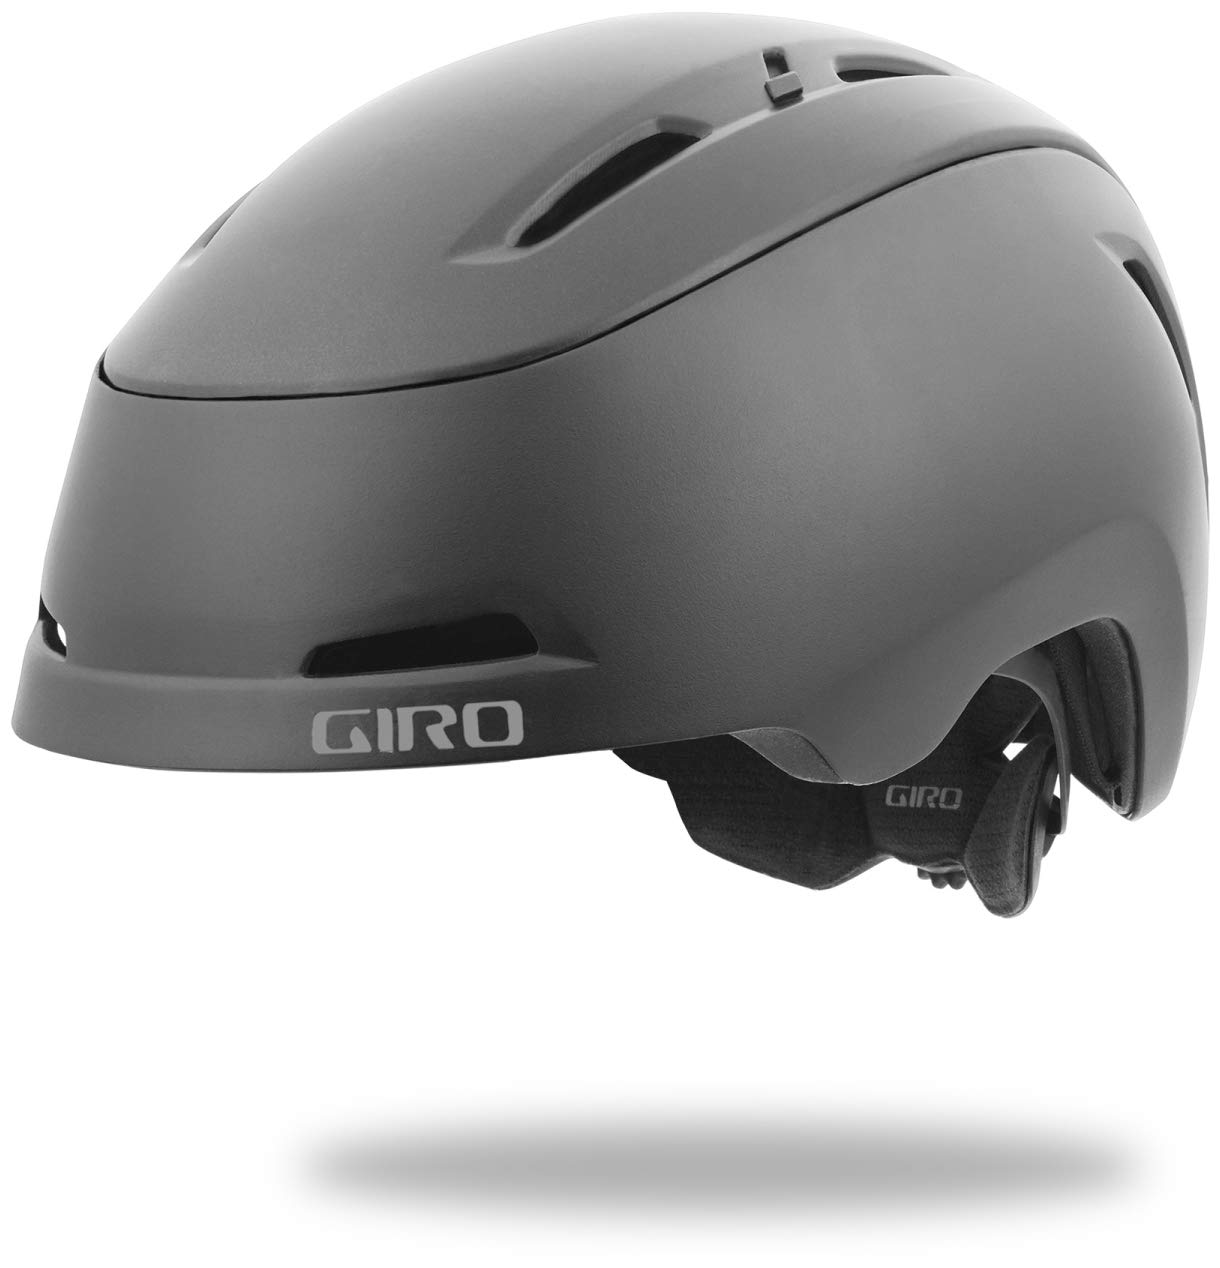 Giro Camden MIPS City Fahrrad Helm grau 2019  Größe  M (55-59cm)